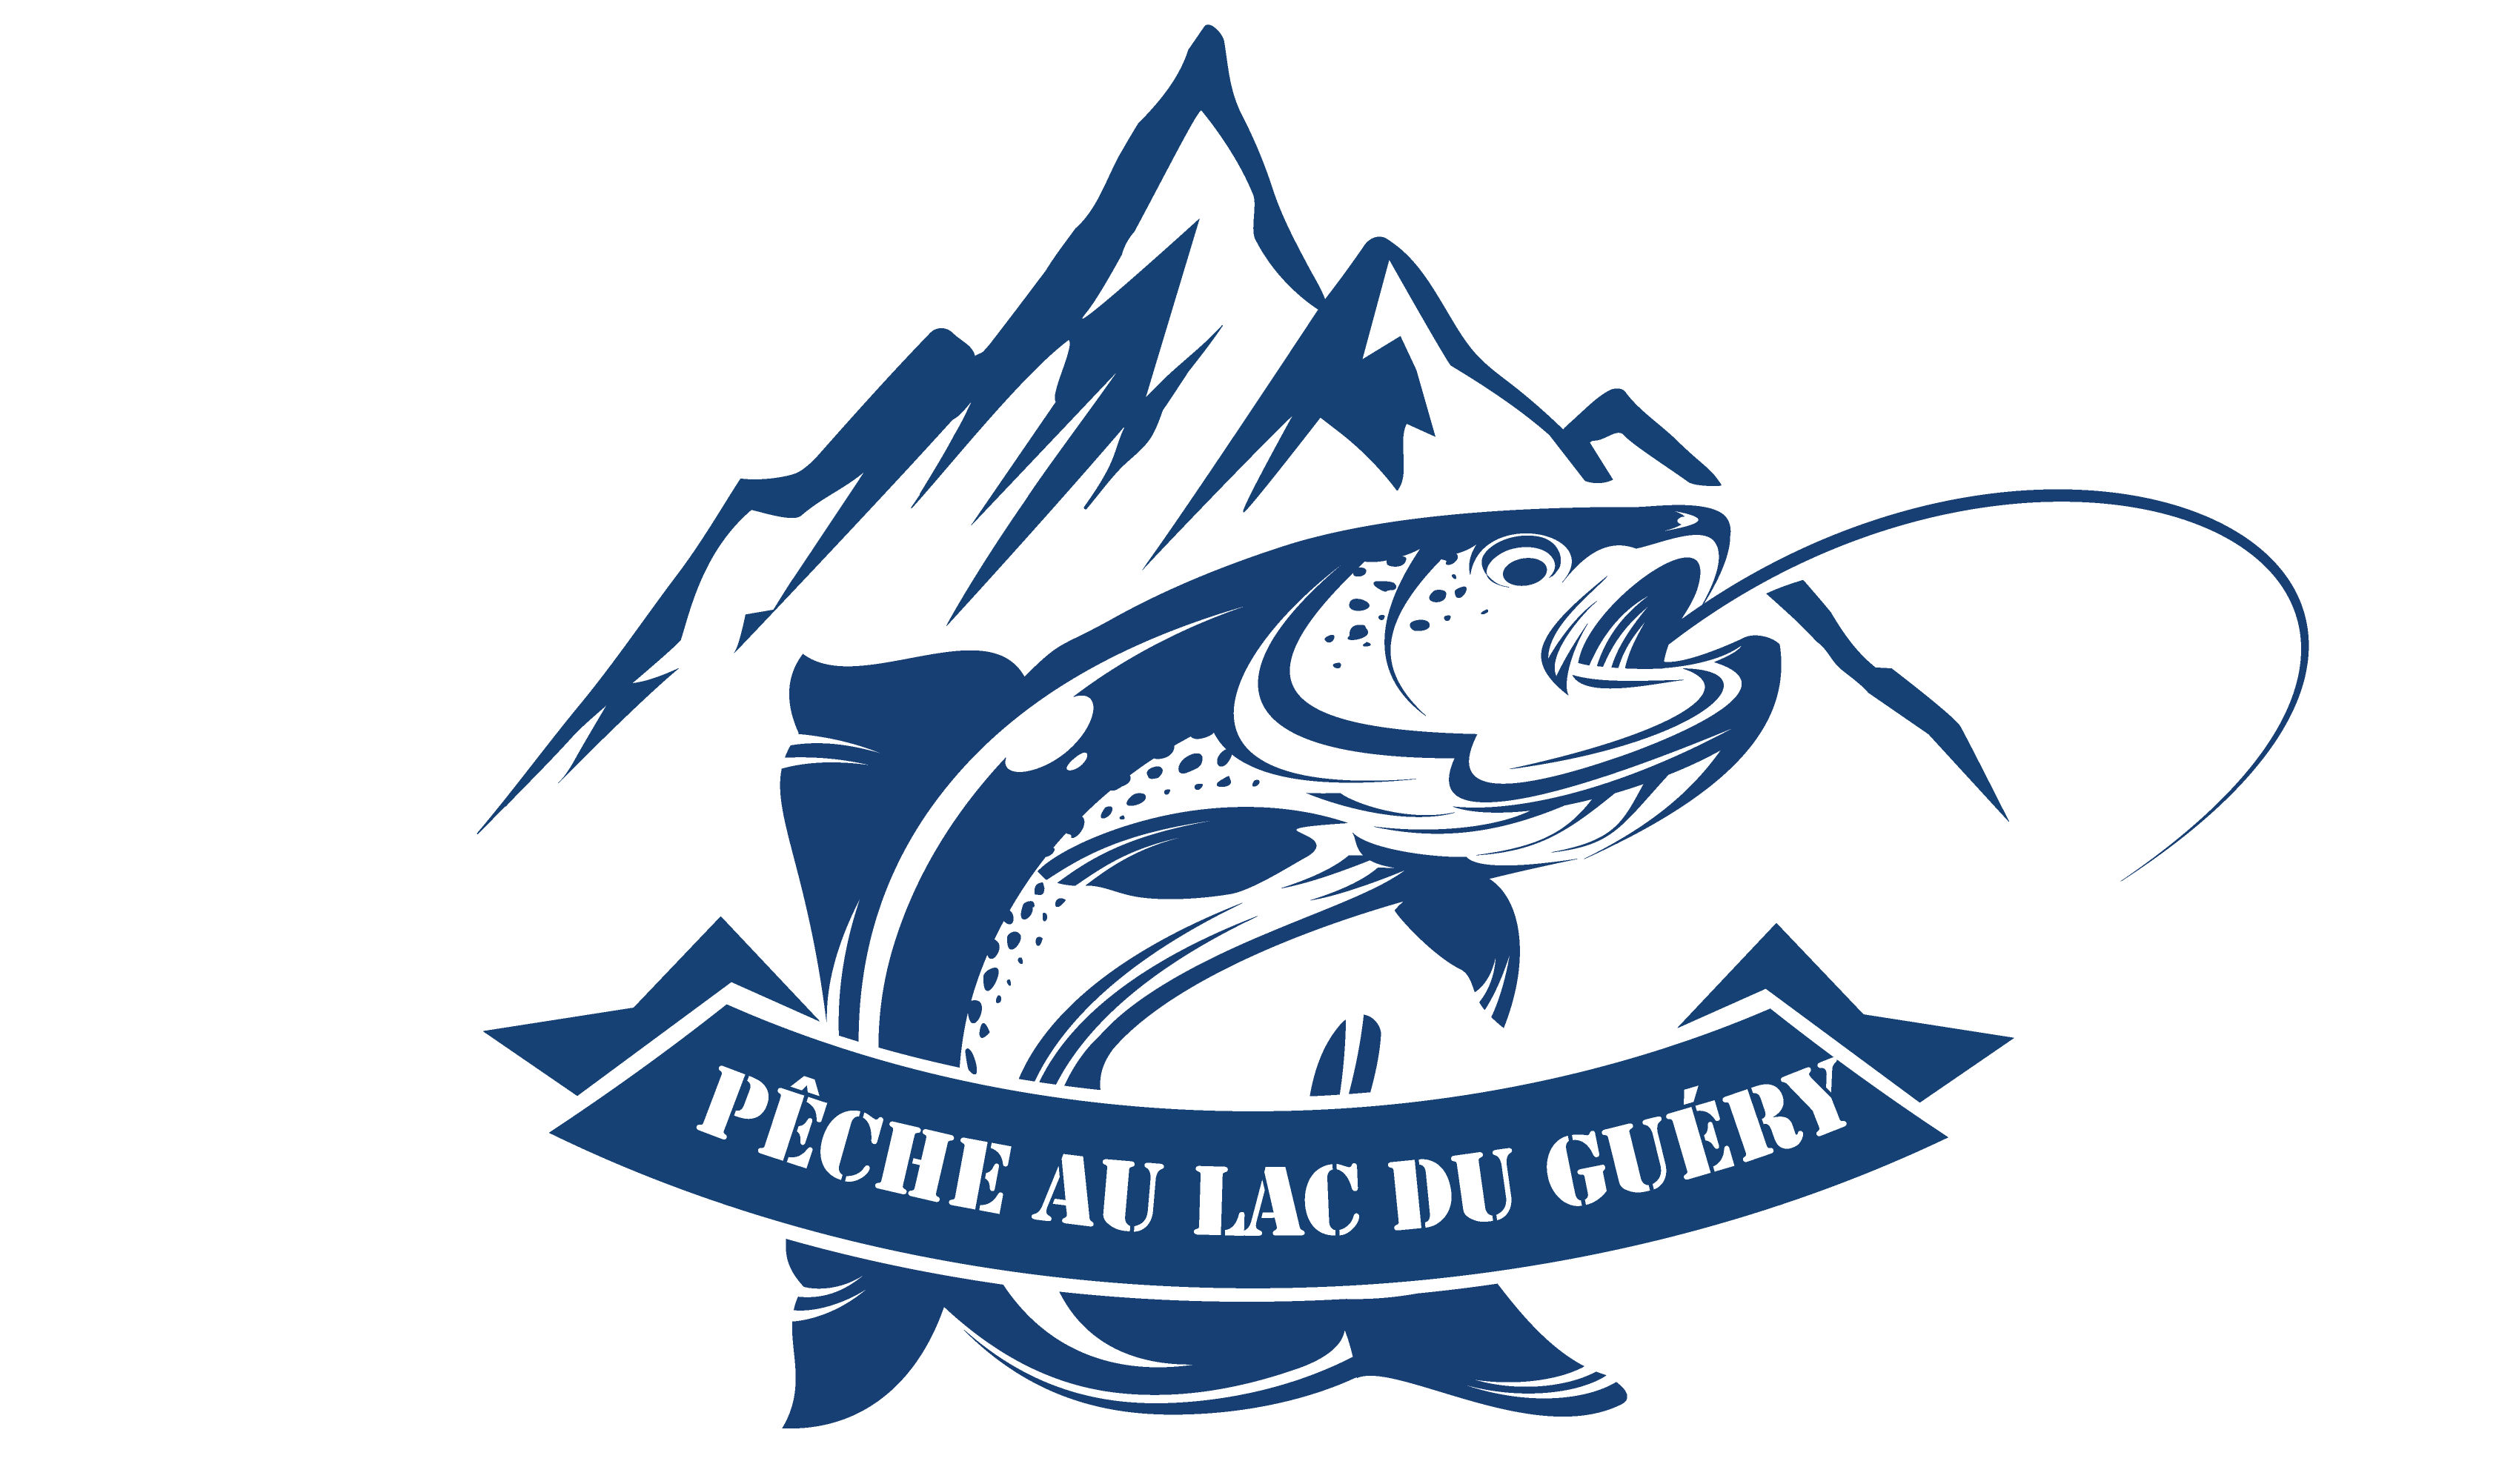 La pêche au lac du guéry